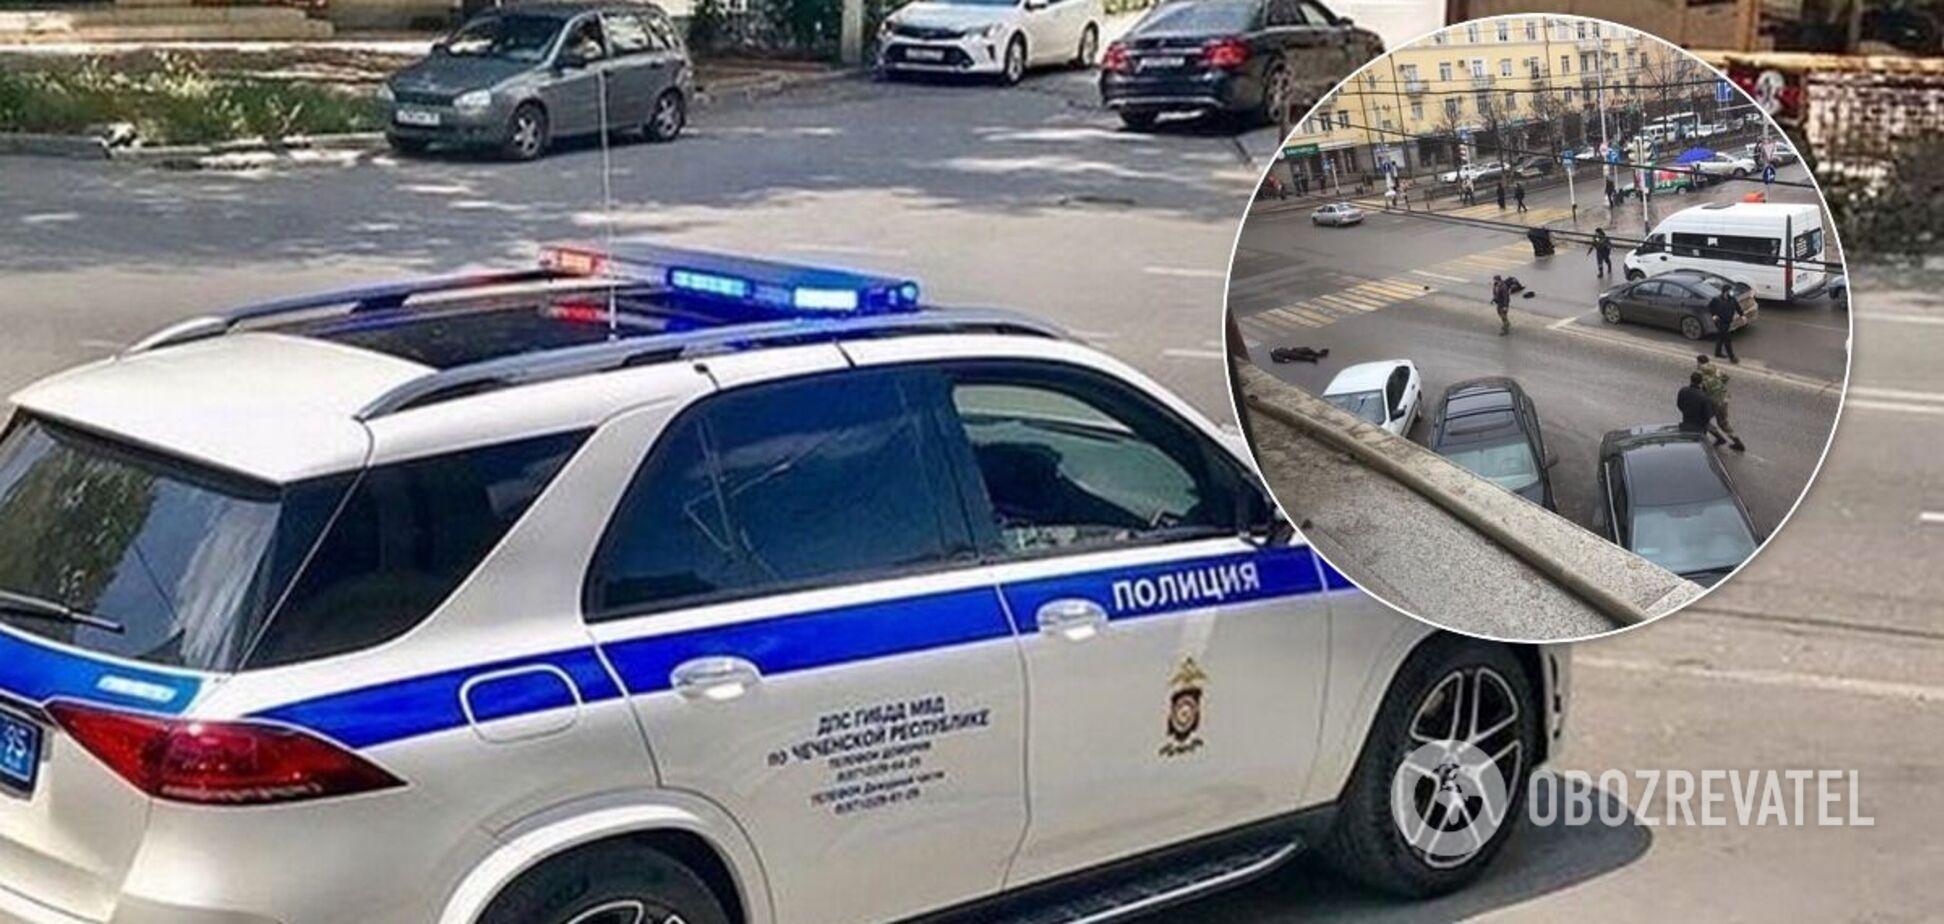 ЧП произошло в центре Грозного